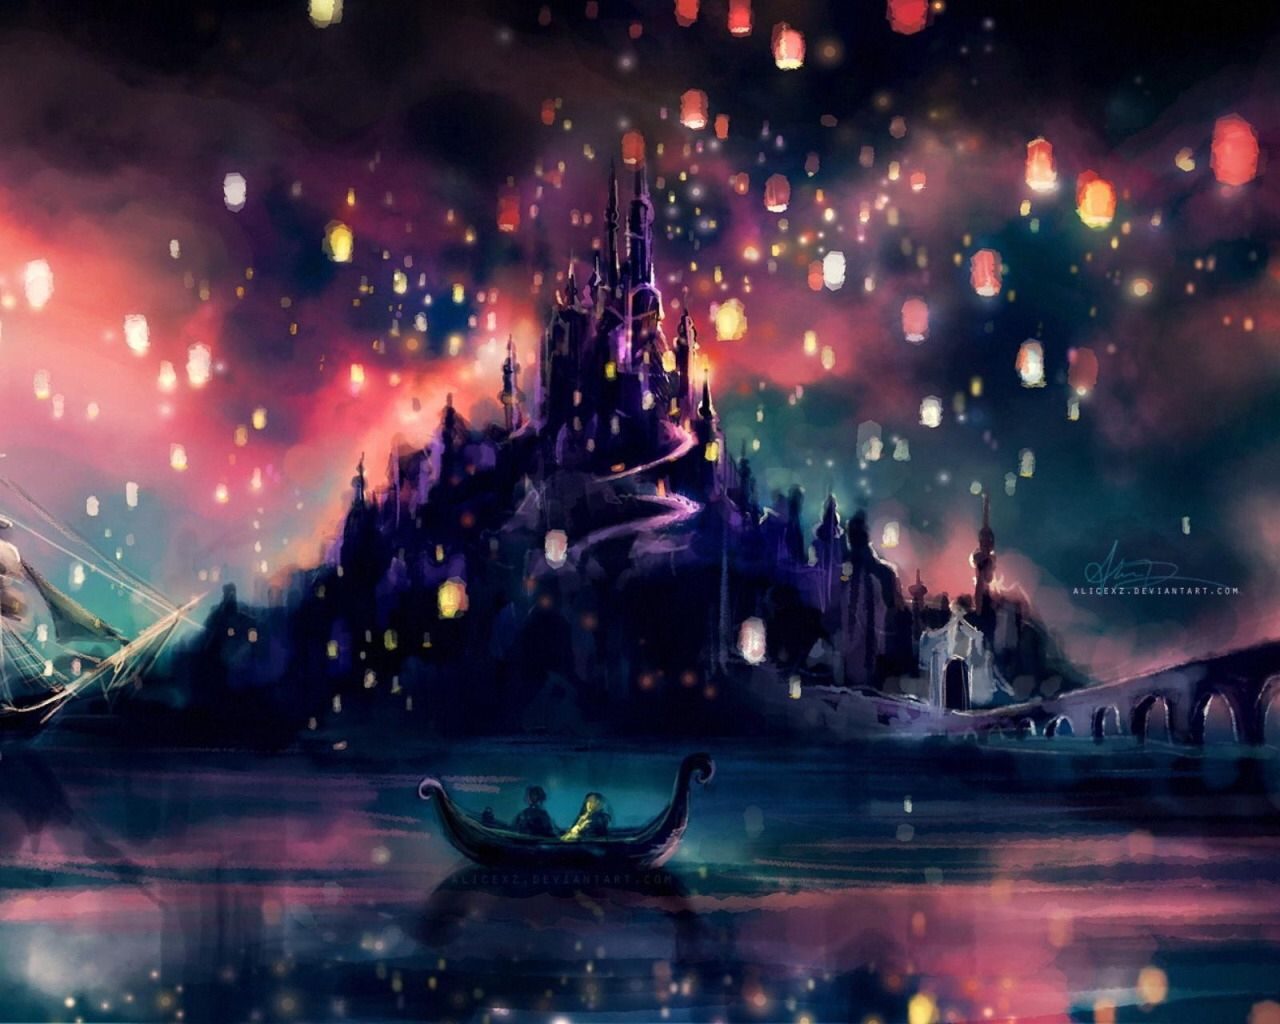 Popular Wallpaper Harry Potter Purple - f3e25456fa93c23517431d2a69be6279  Trends_801089.jpg